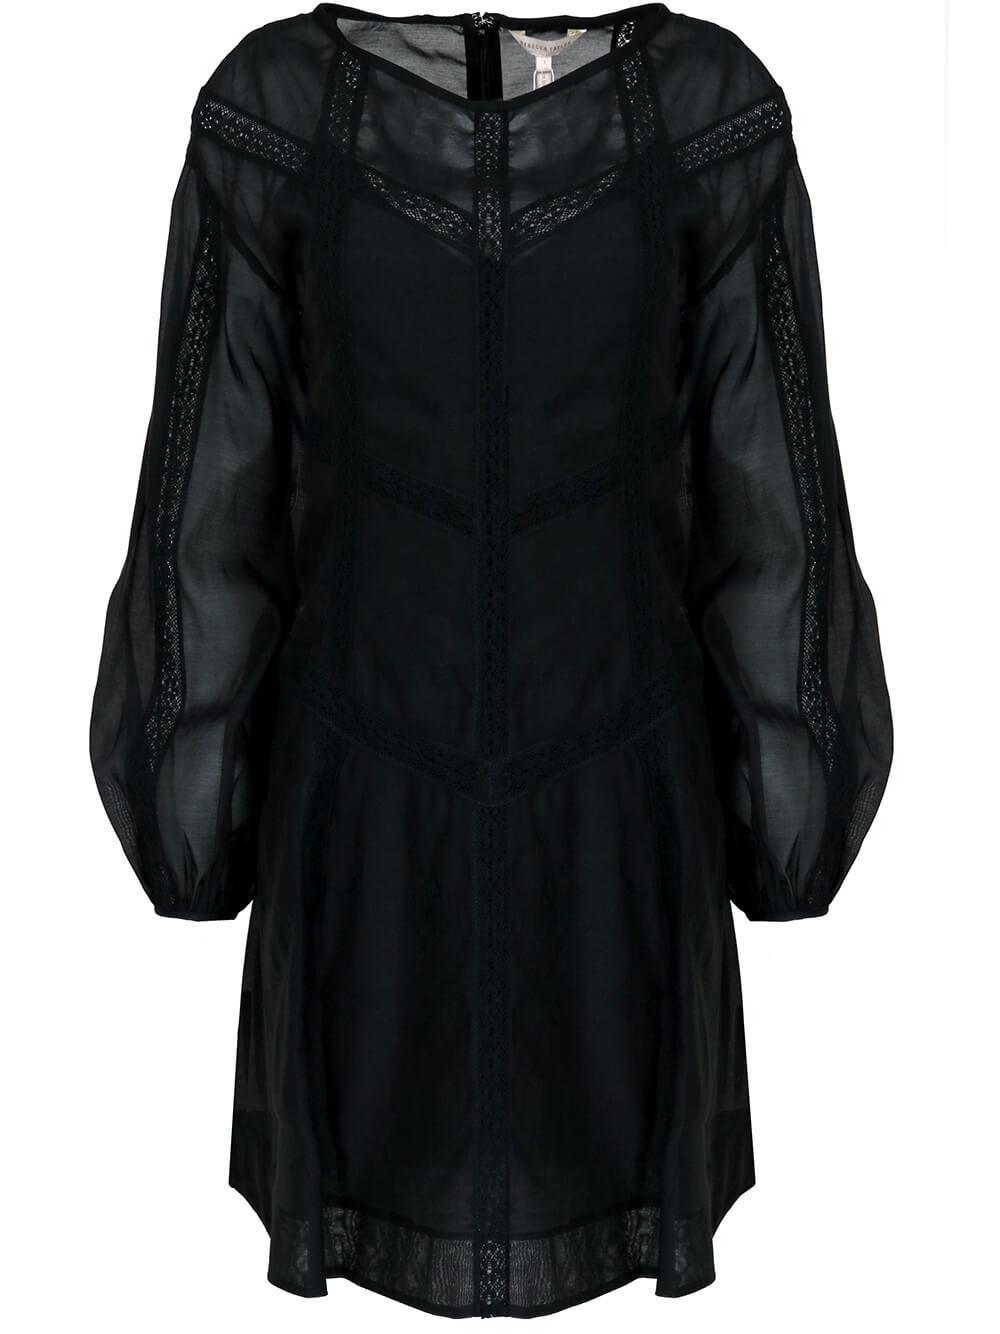 Cotton Organza Dress Item # 121127D745